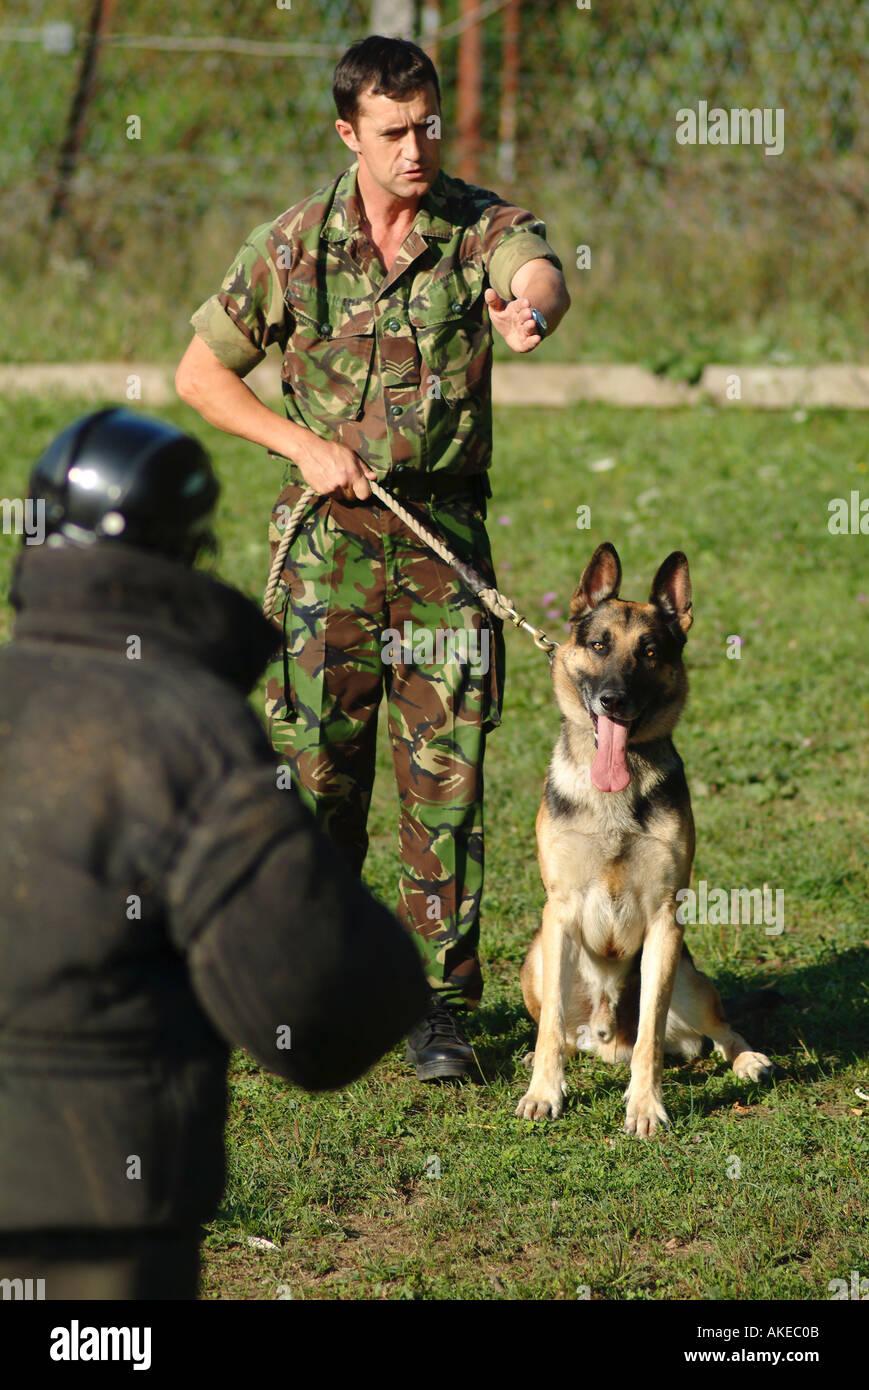 British Army Dog Handler During a Training Exercise - Stock Image